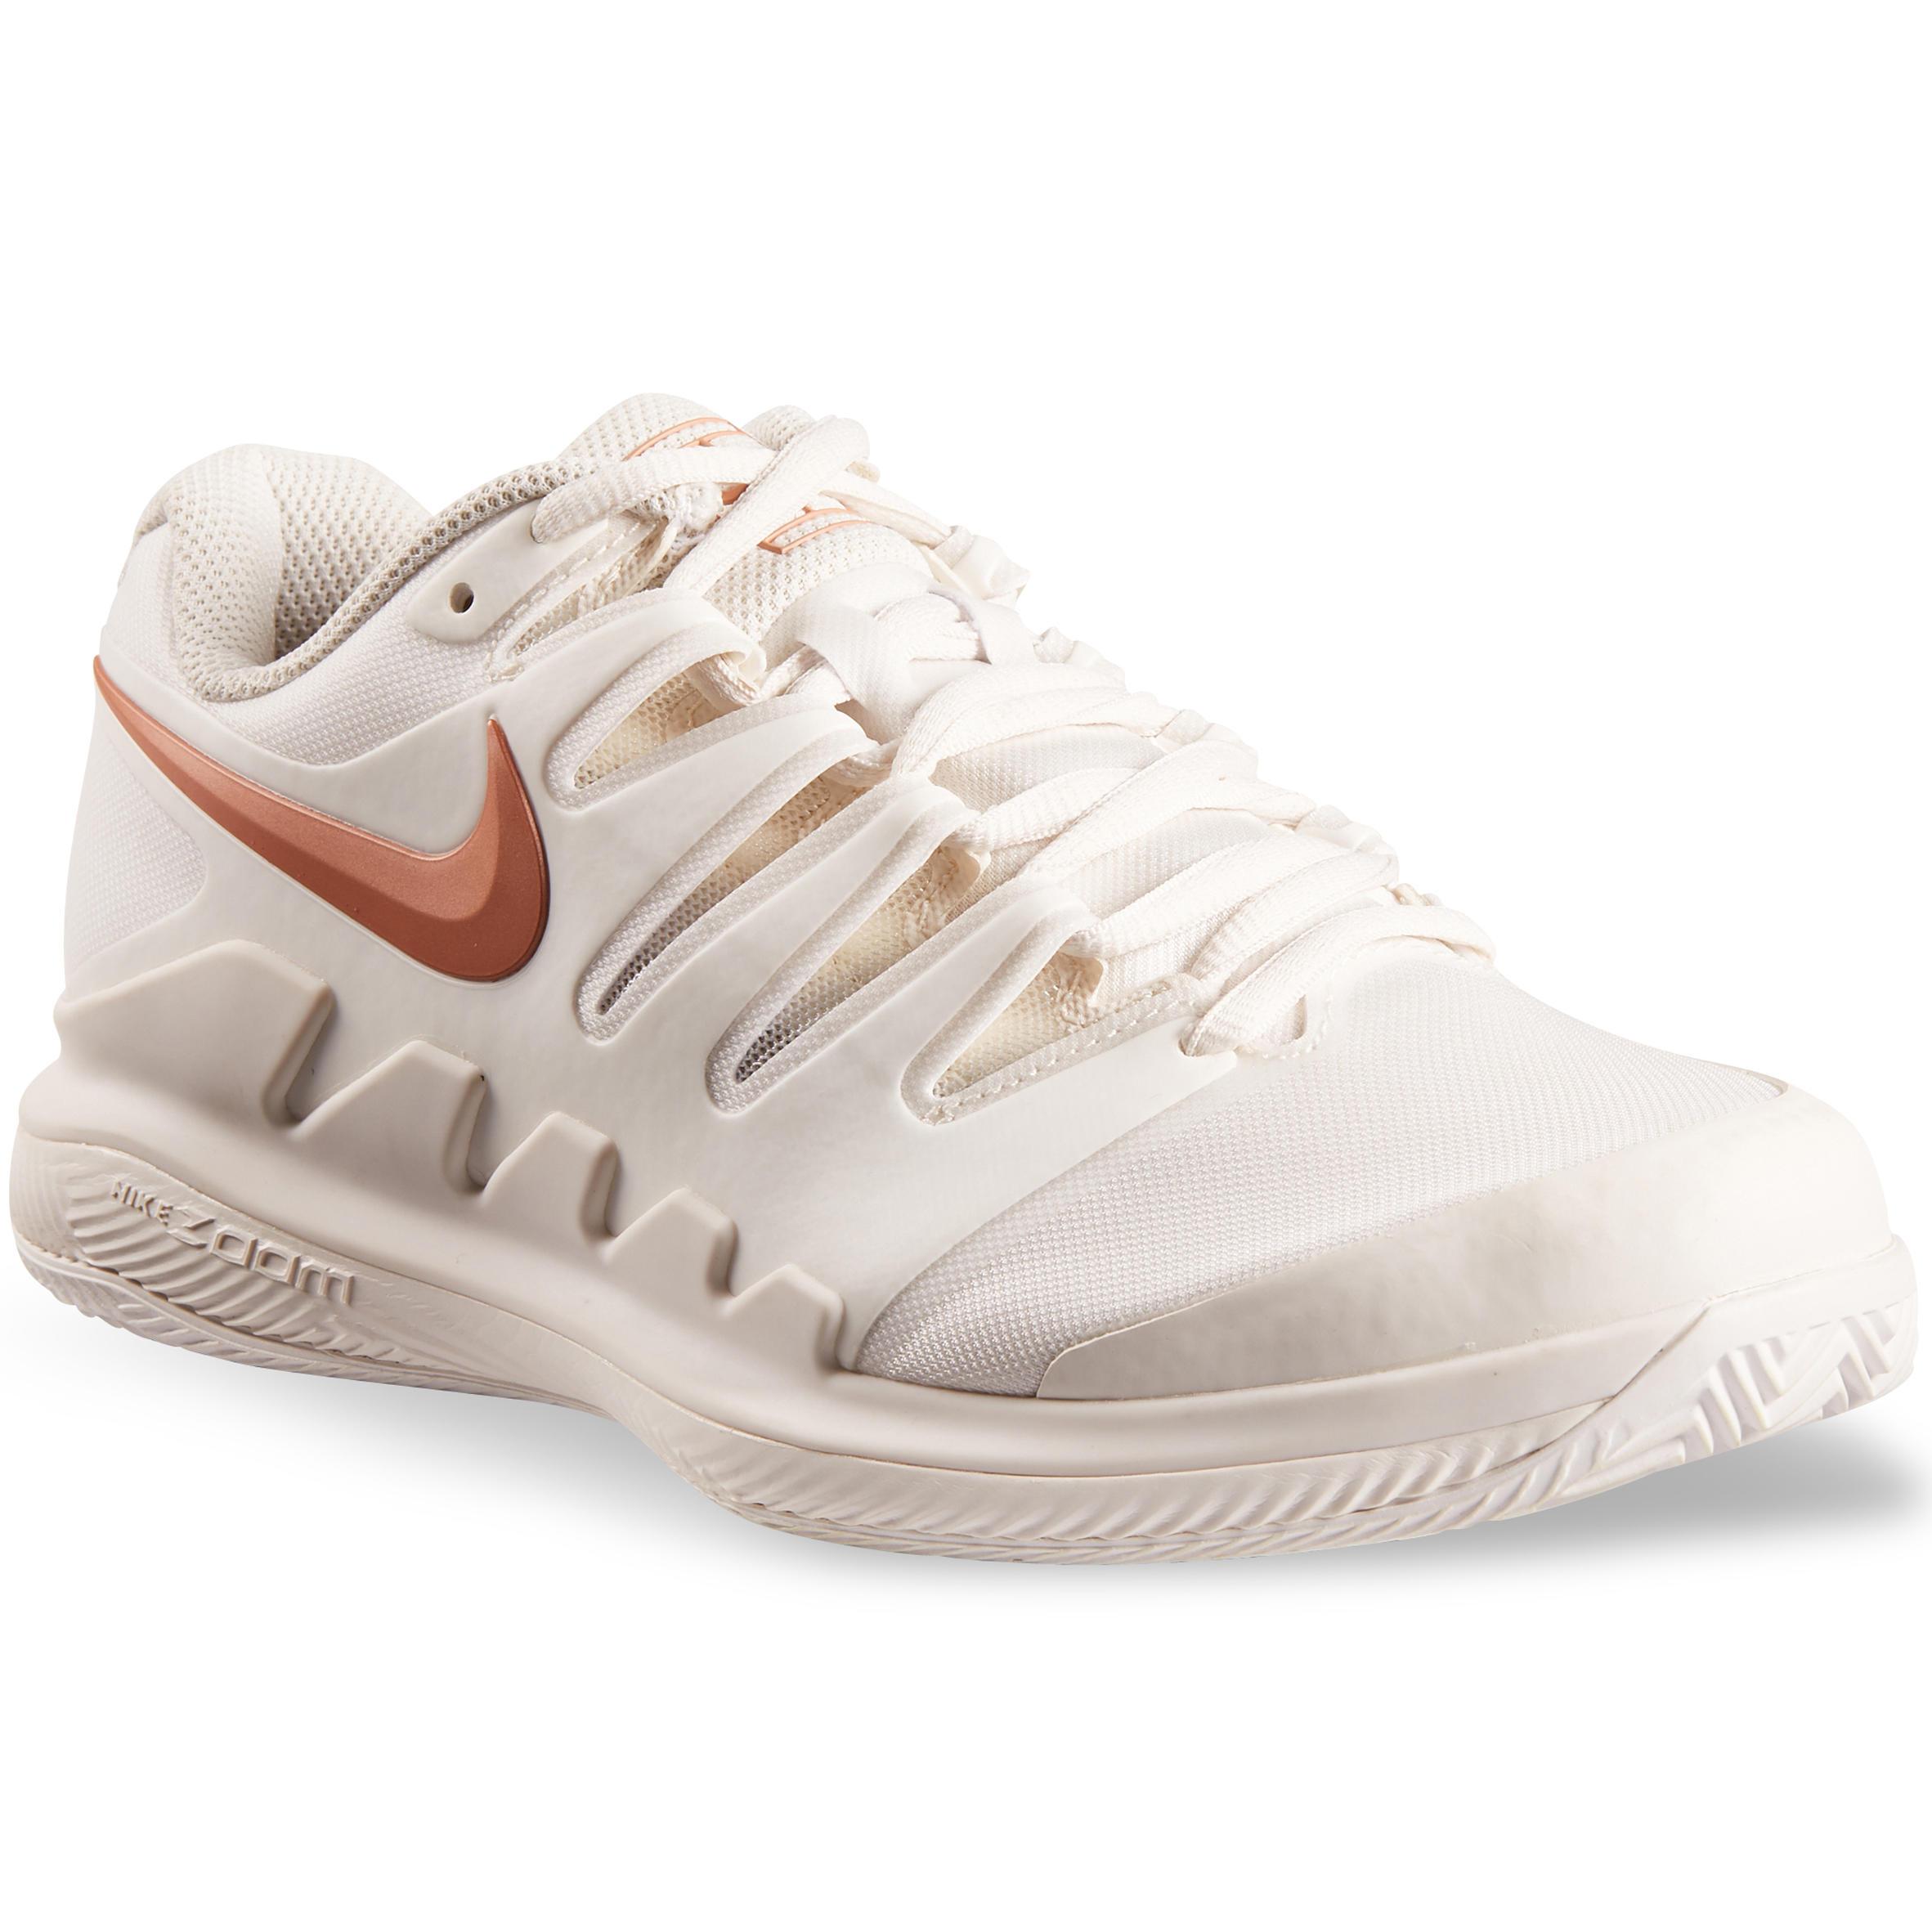 chaussures tennis femme nike